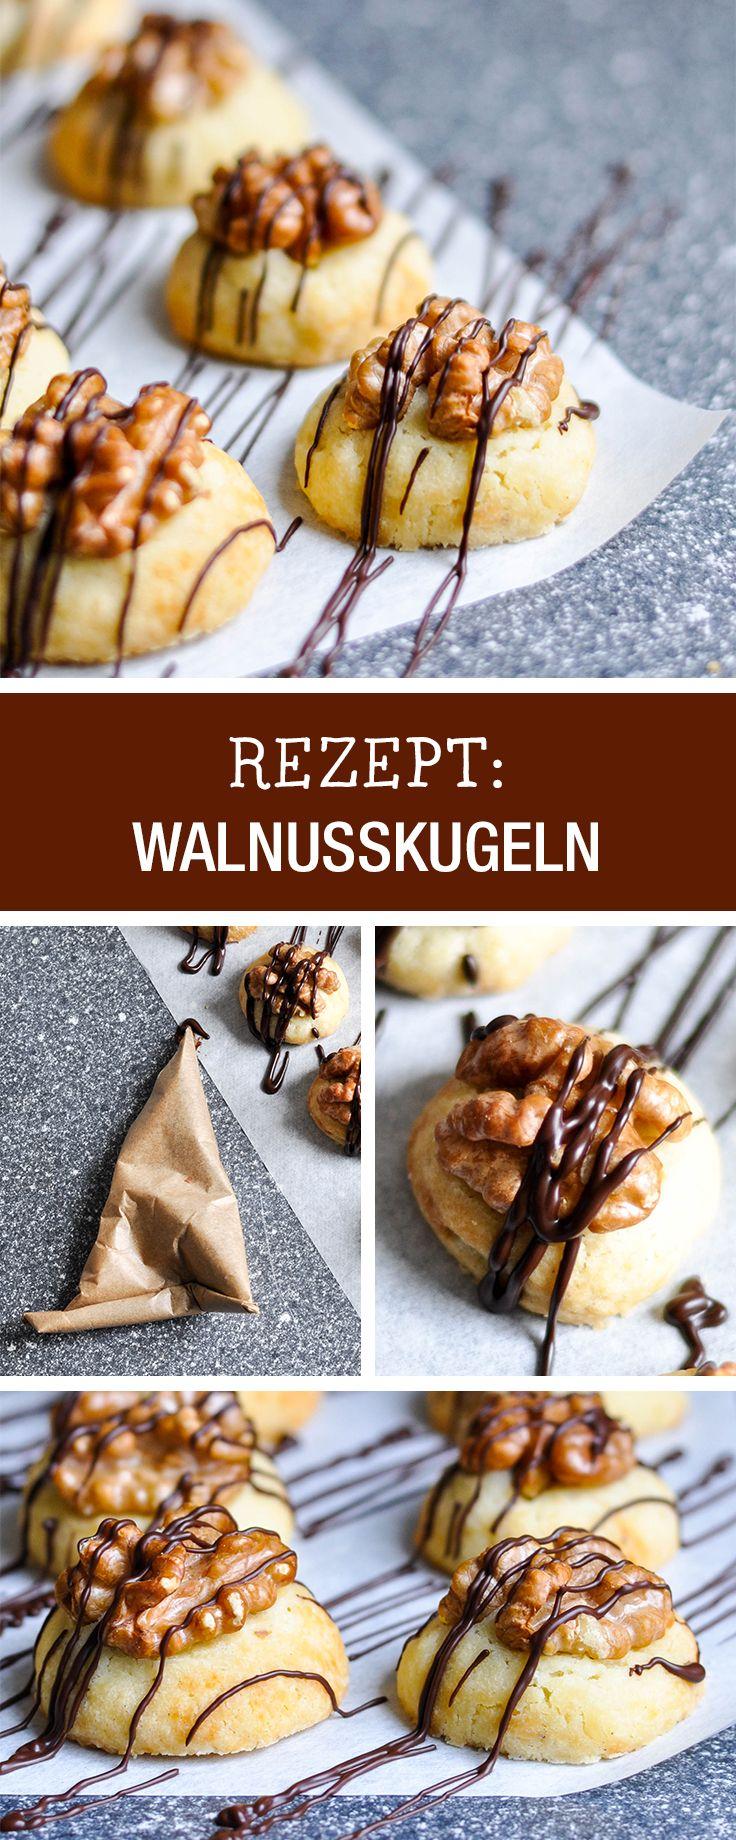 Rezeptidee für die Weihnachtsbäckerei: Walnusskugeln mit Zartbitterschokolade / christmas bakery: recipe for walnut cookies via DaWanda.com